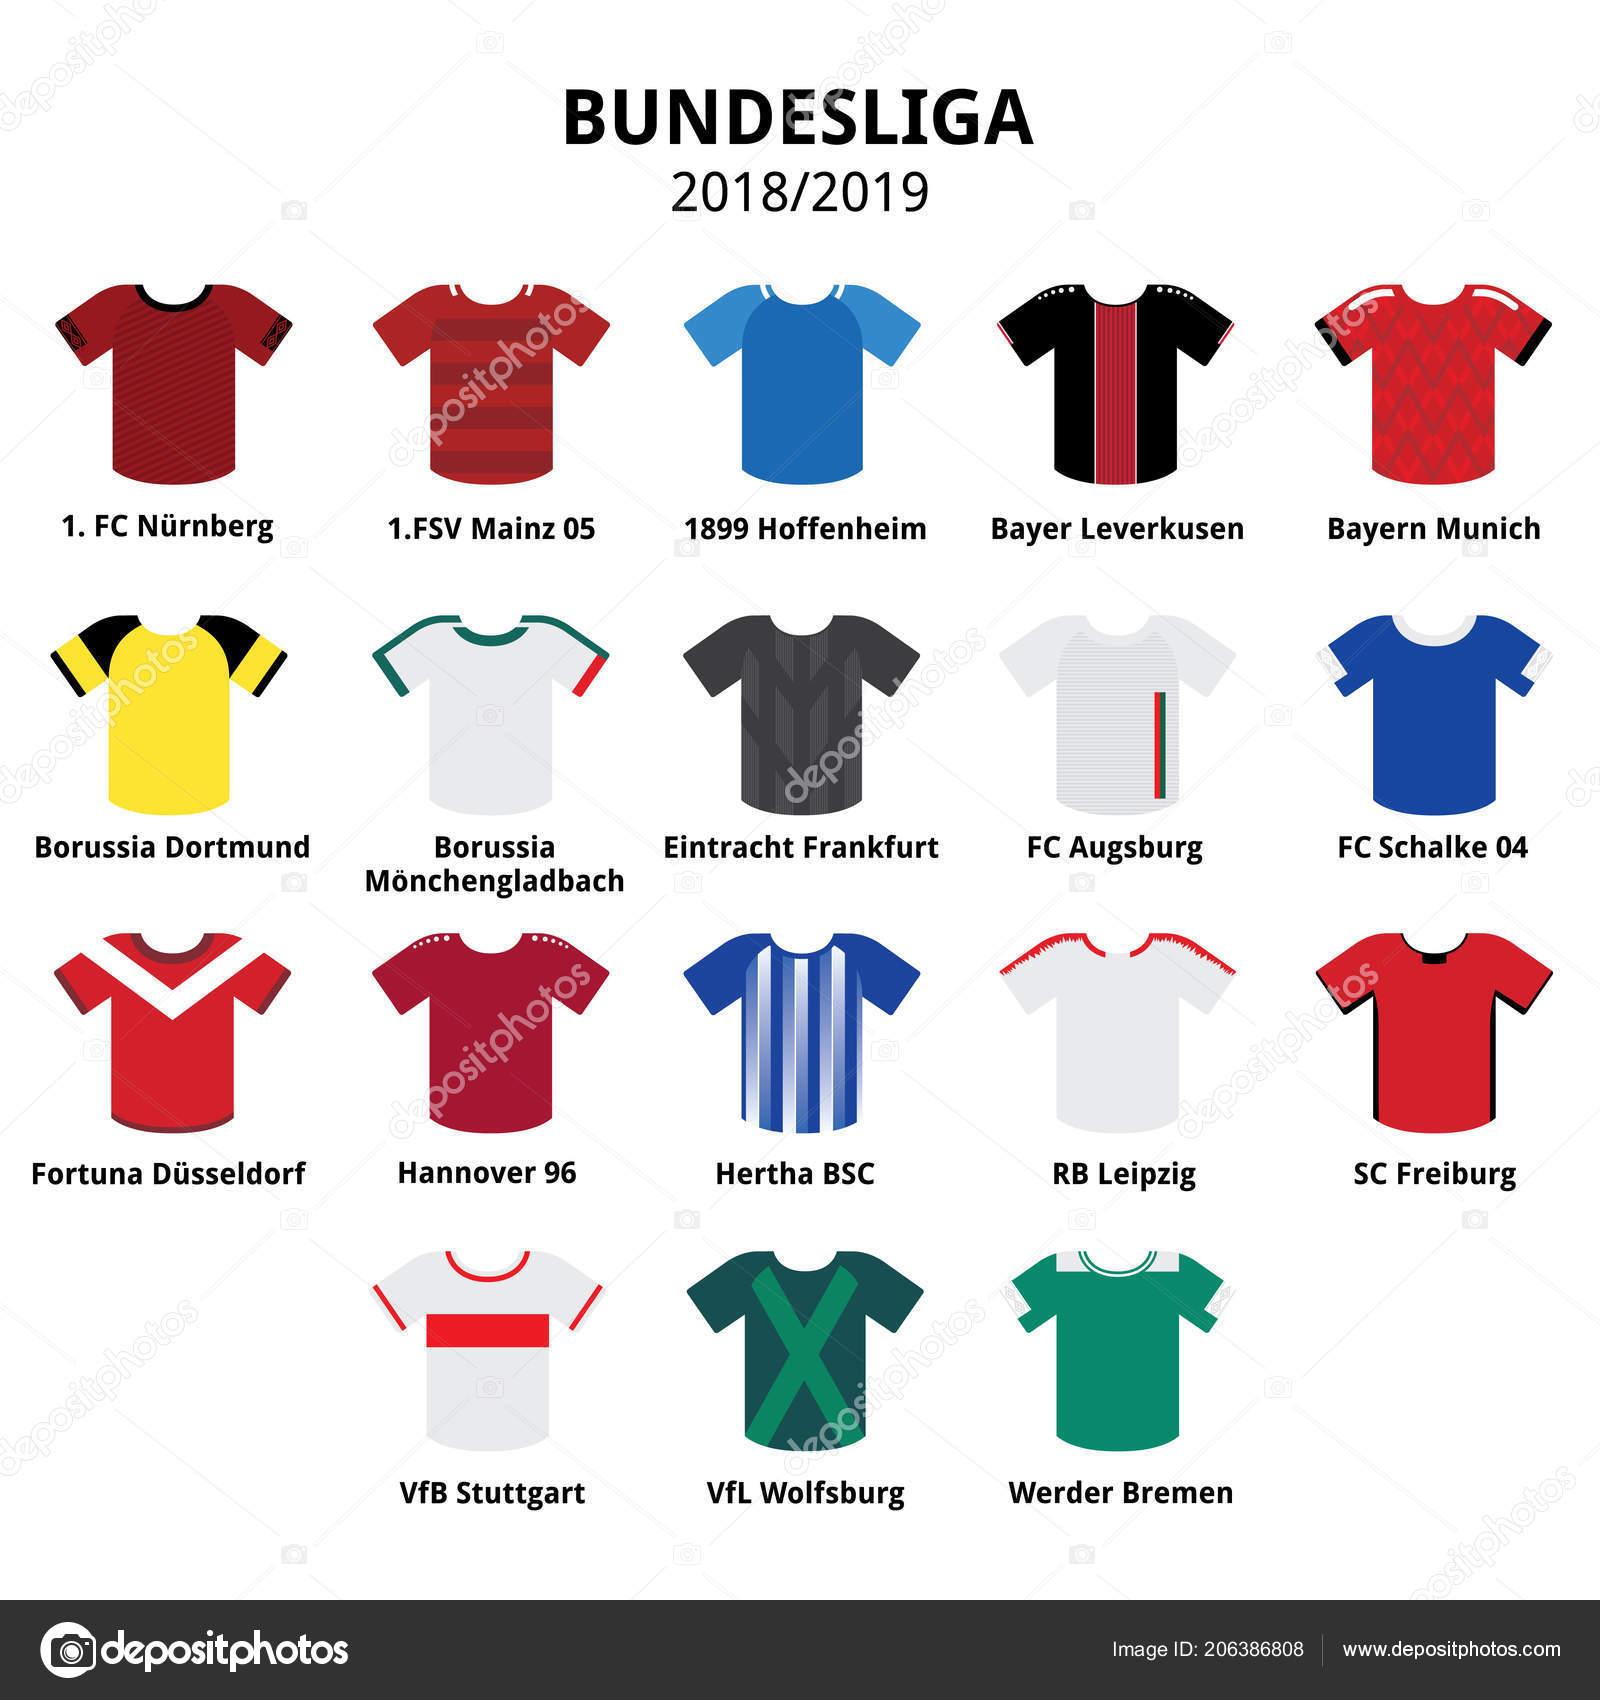 Bundesliga Trikots Kit 2018 2019 Deutsche Fussball Liga